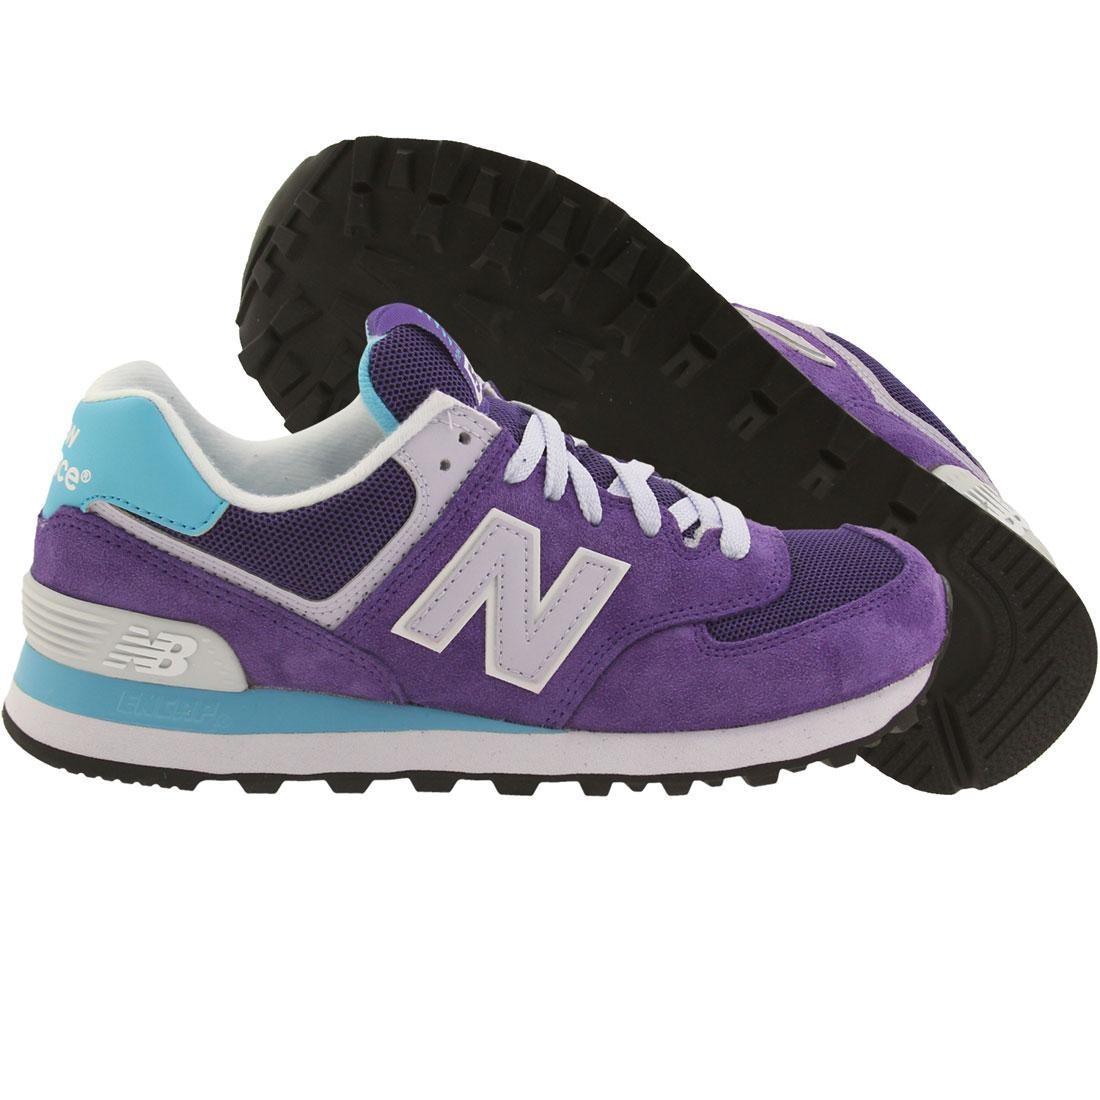 Cheap new balance 574 women purple